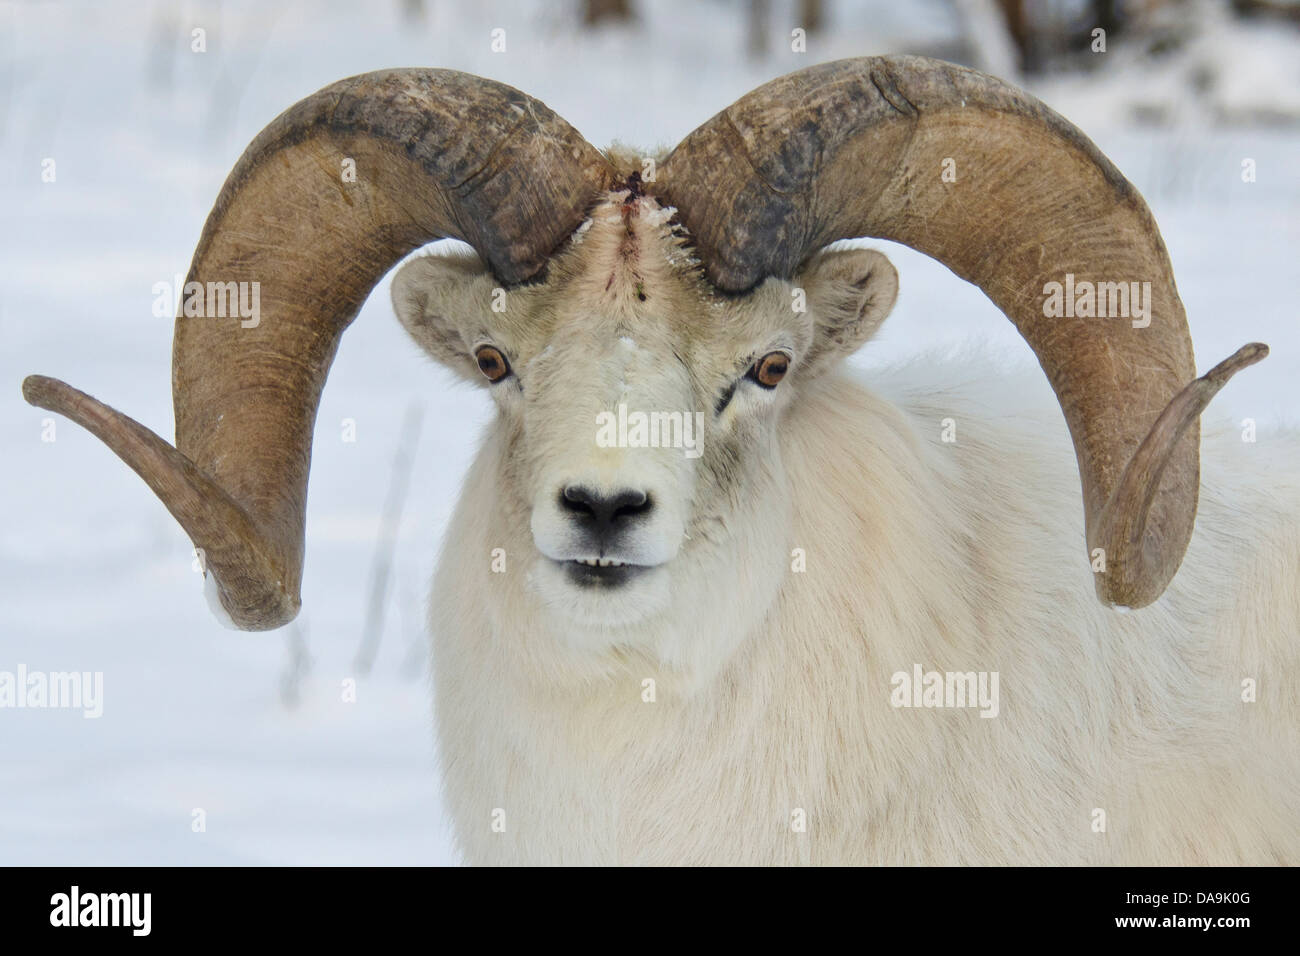 Ram Big Horn >> dall sheep, ovis dalli, Yukon, wildlife, preserve, Canada, sheep Stock Photo, Royalty Free Image ...